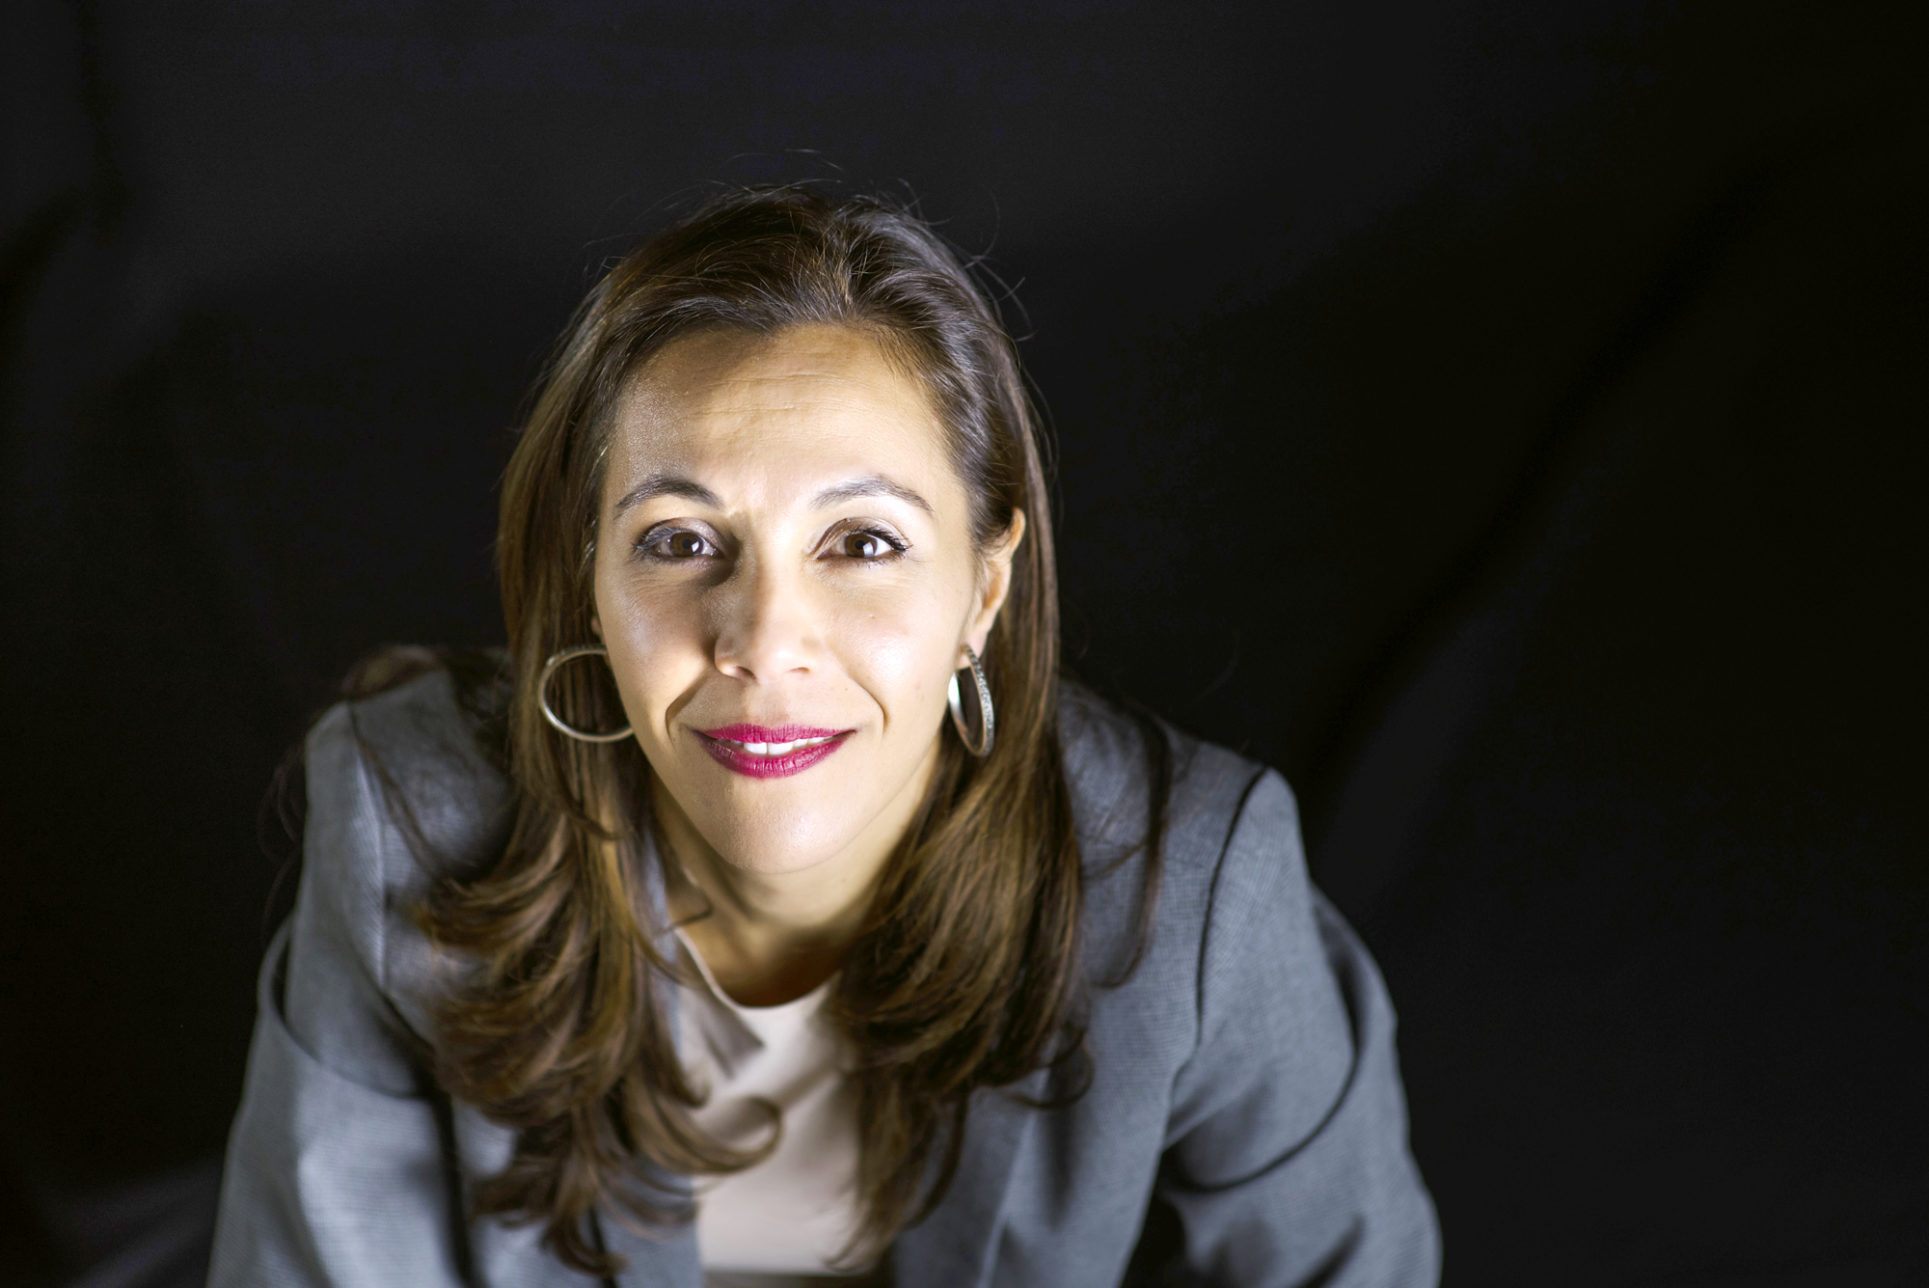 Mara Mollá lanza su nueva novela 'La perla azul' en junio El Periòdic d'Ontinyent - Noticies a Ontinyent